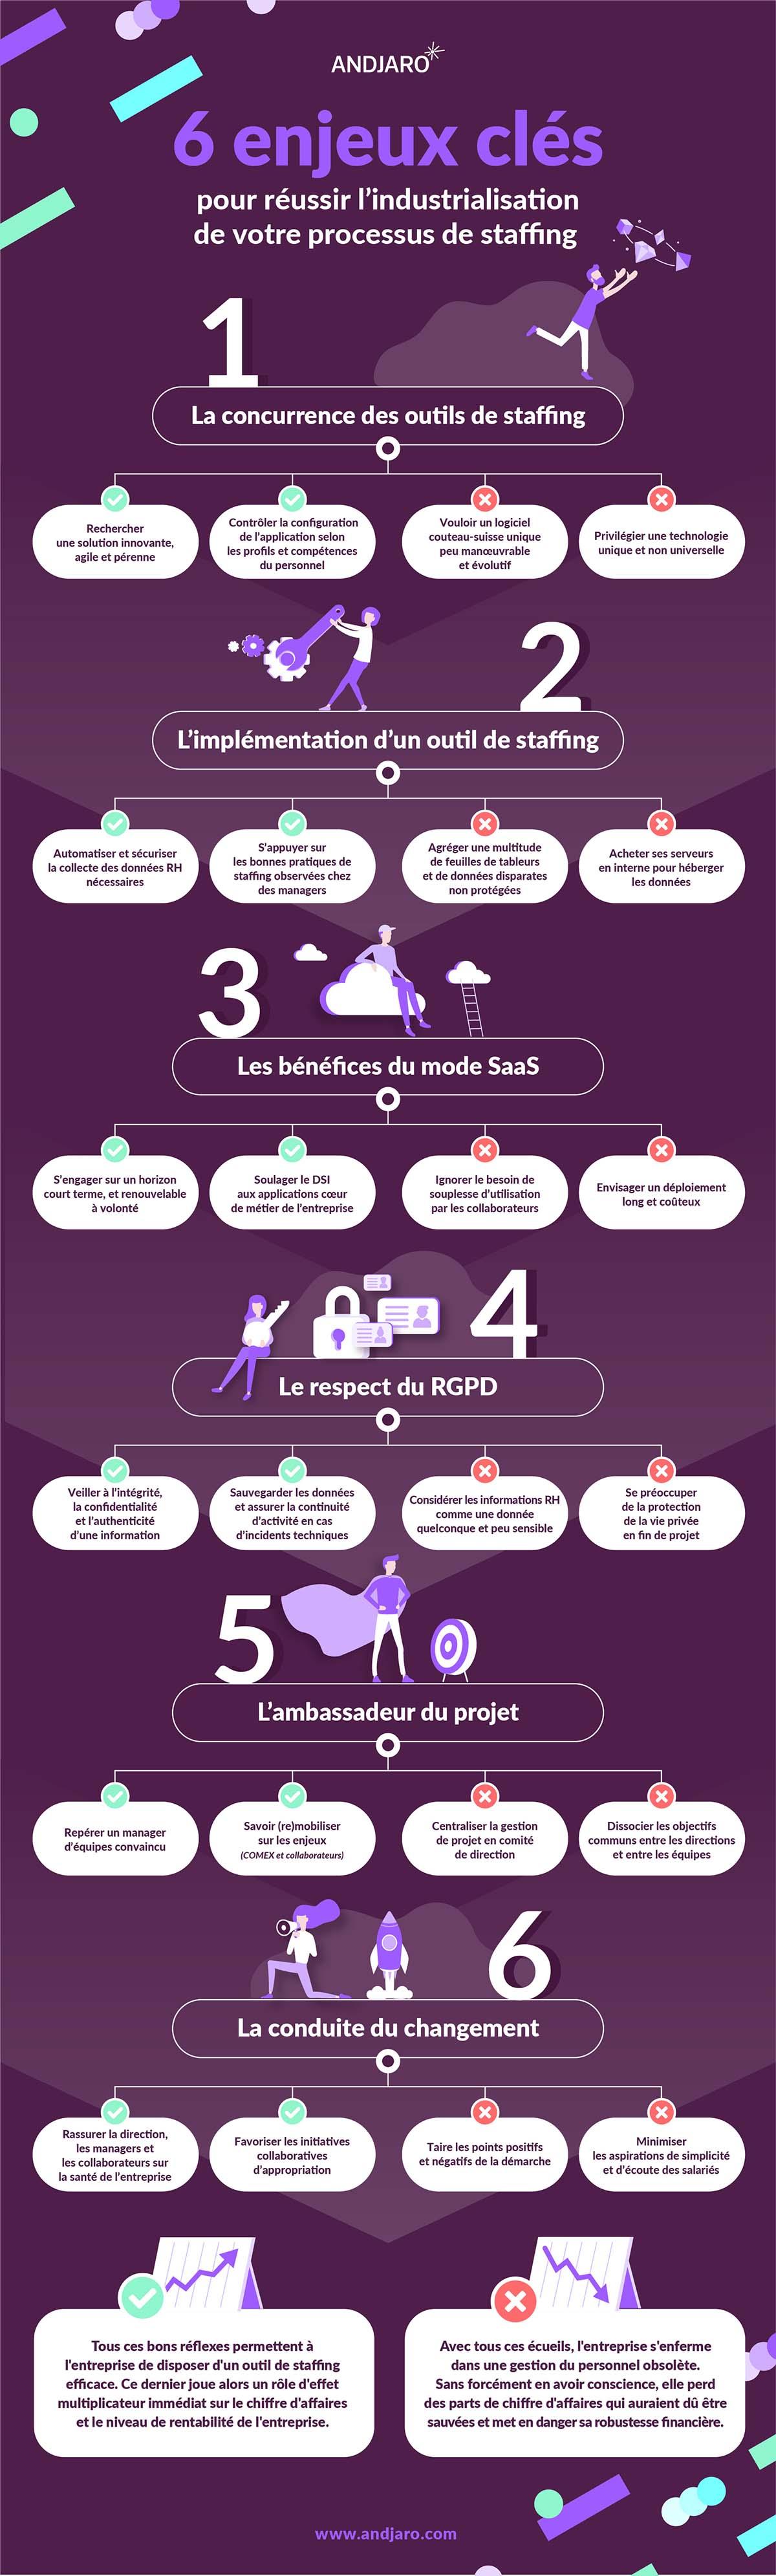 Andjaro infographie processus de staffing